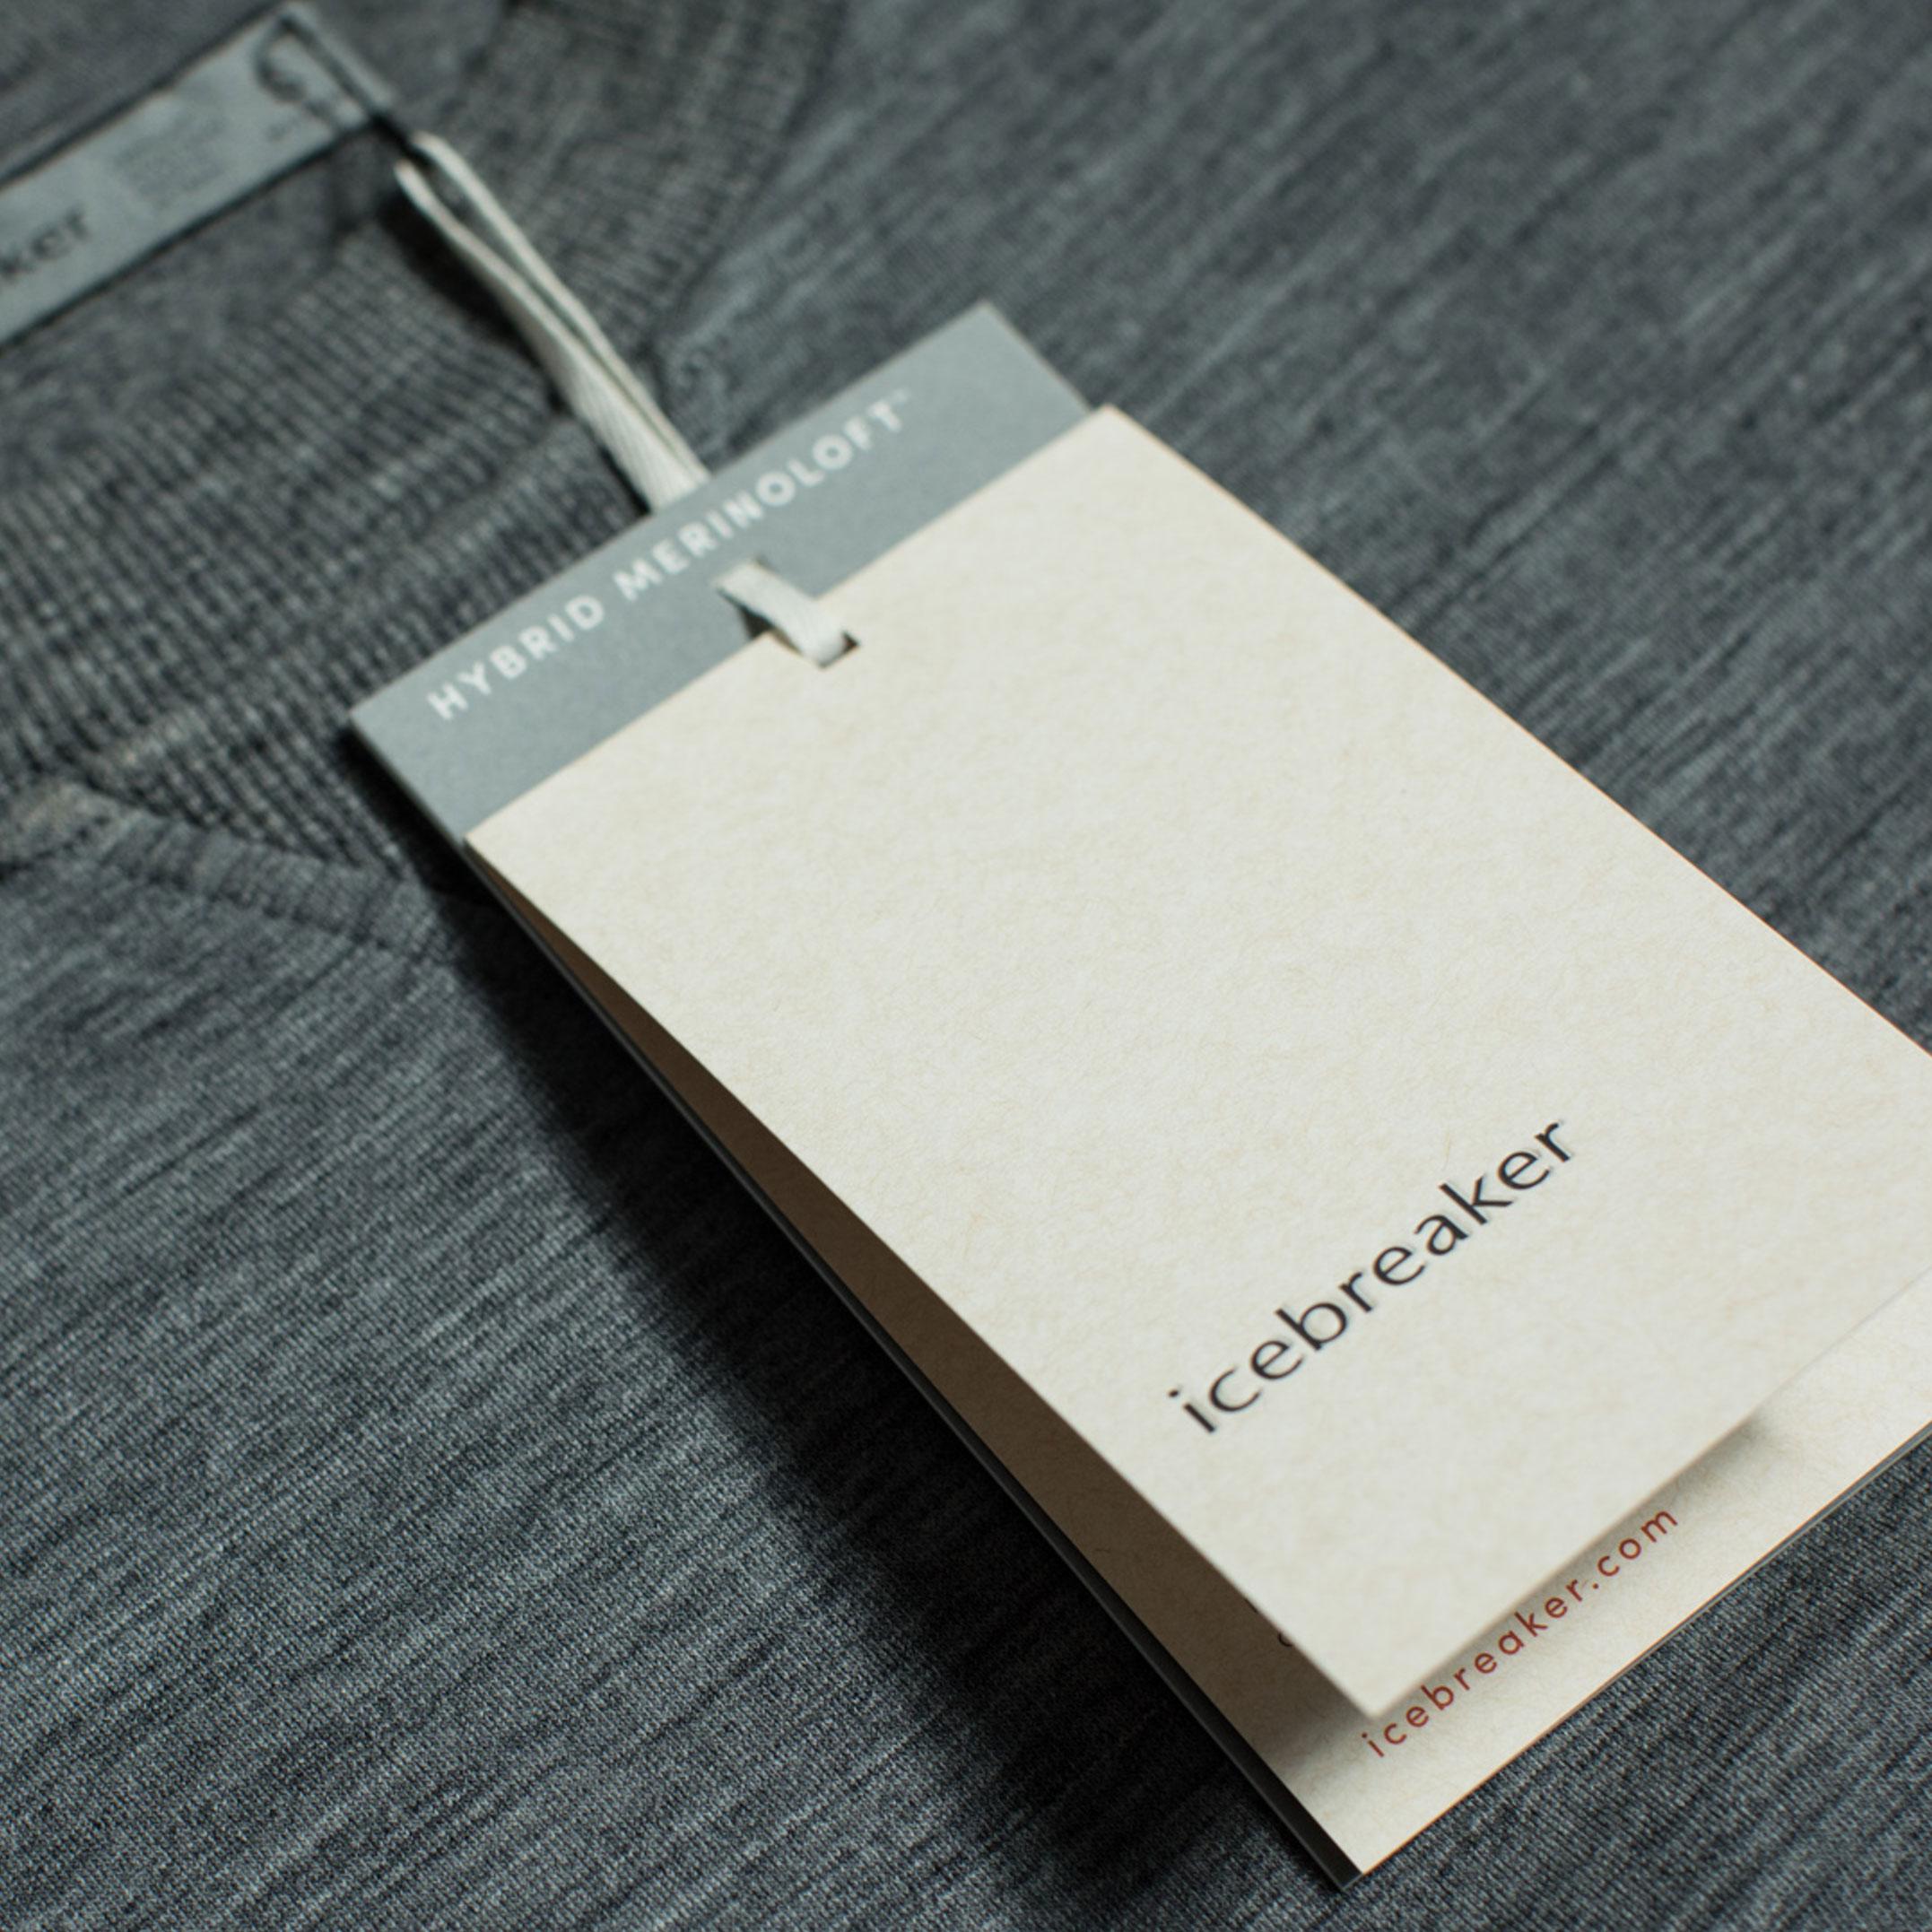 icebreaker's swing tag